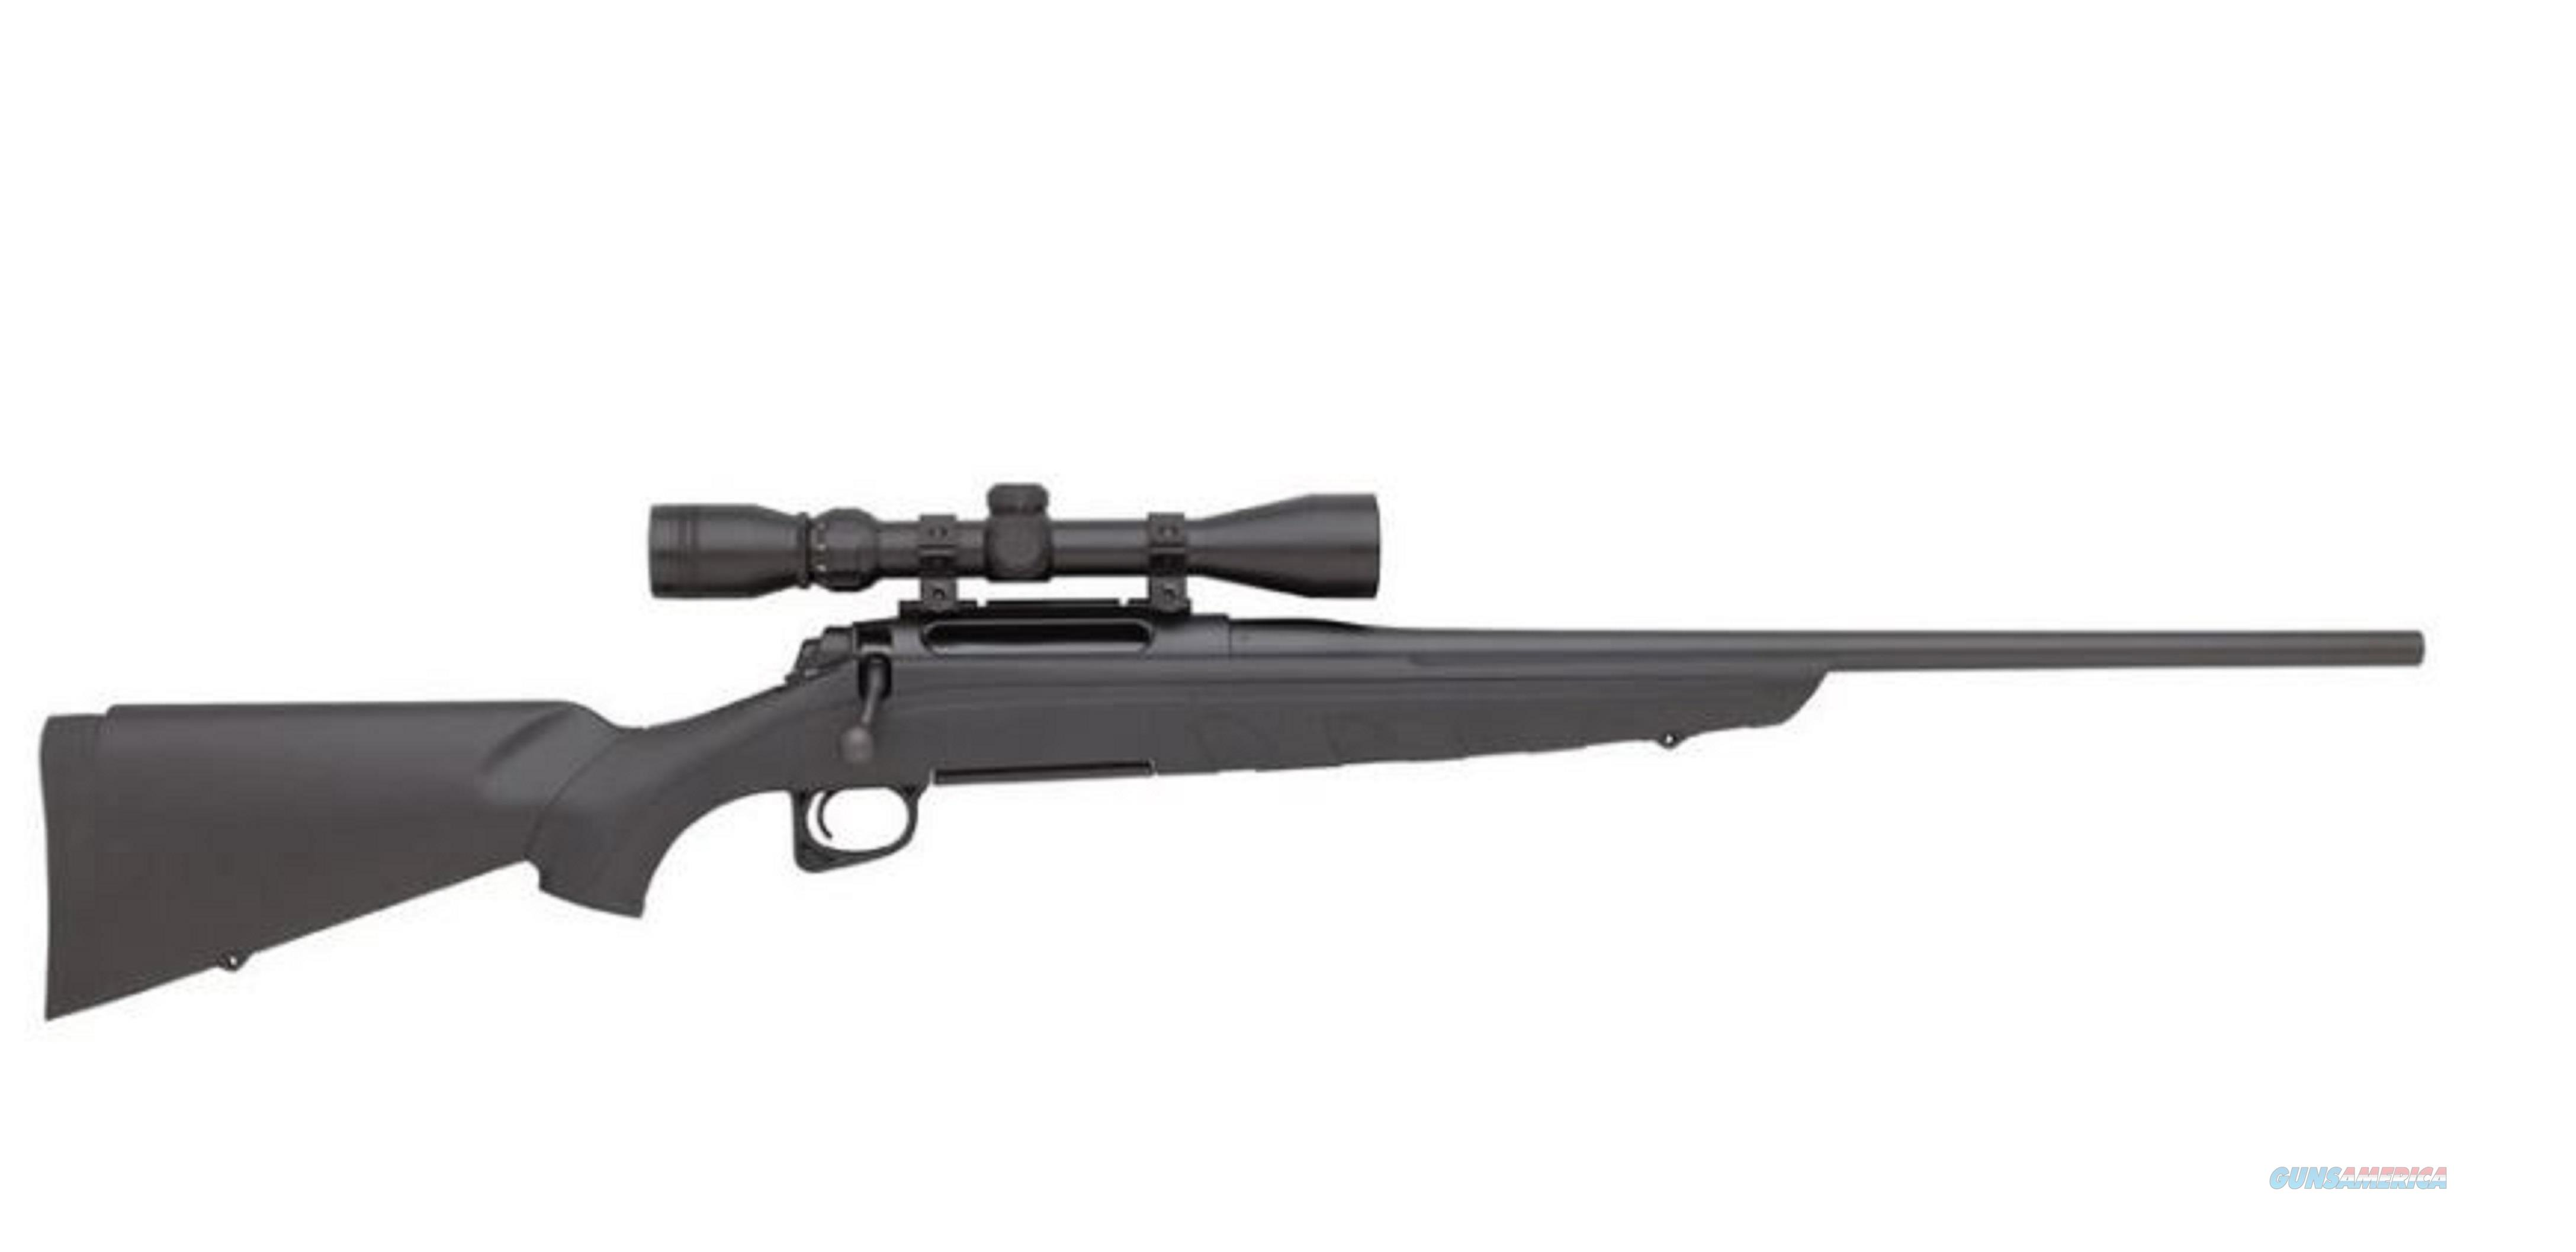 REMINGTON MODEL 770 - 270 WIN RIFLE WITH SCOPE - NIB  Guns > Rifles > Remington Rifles - Modern > Other